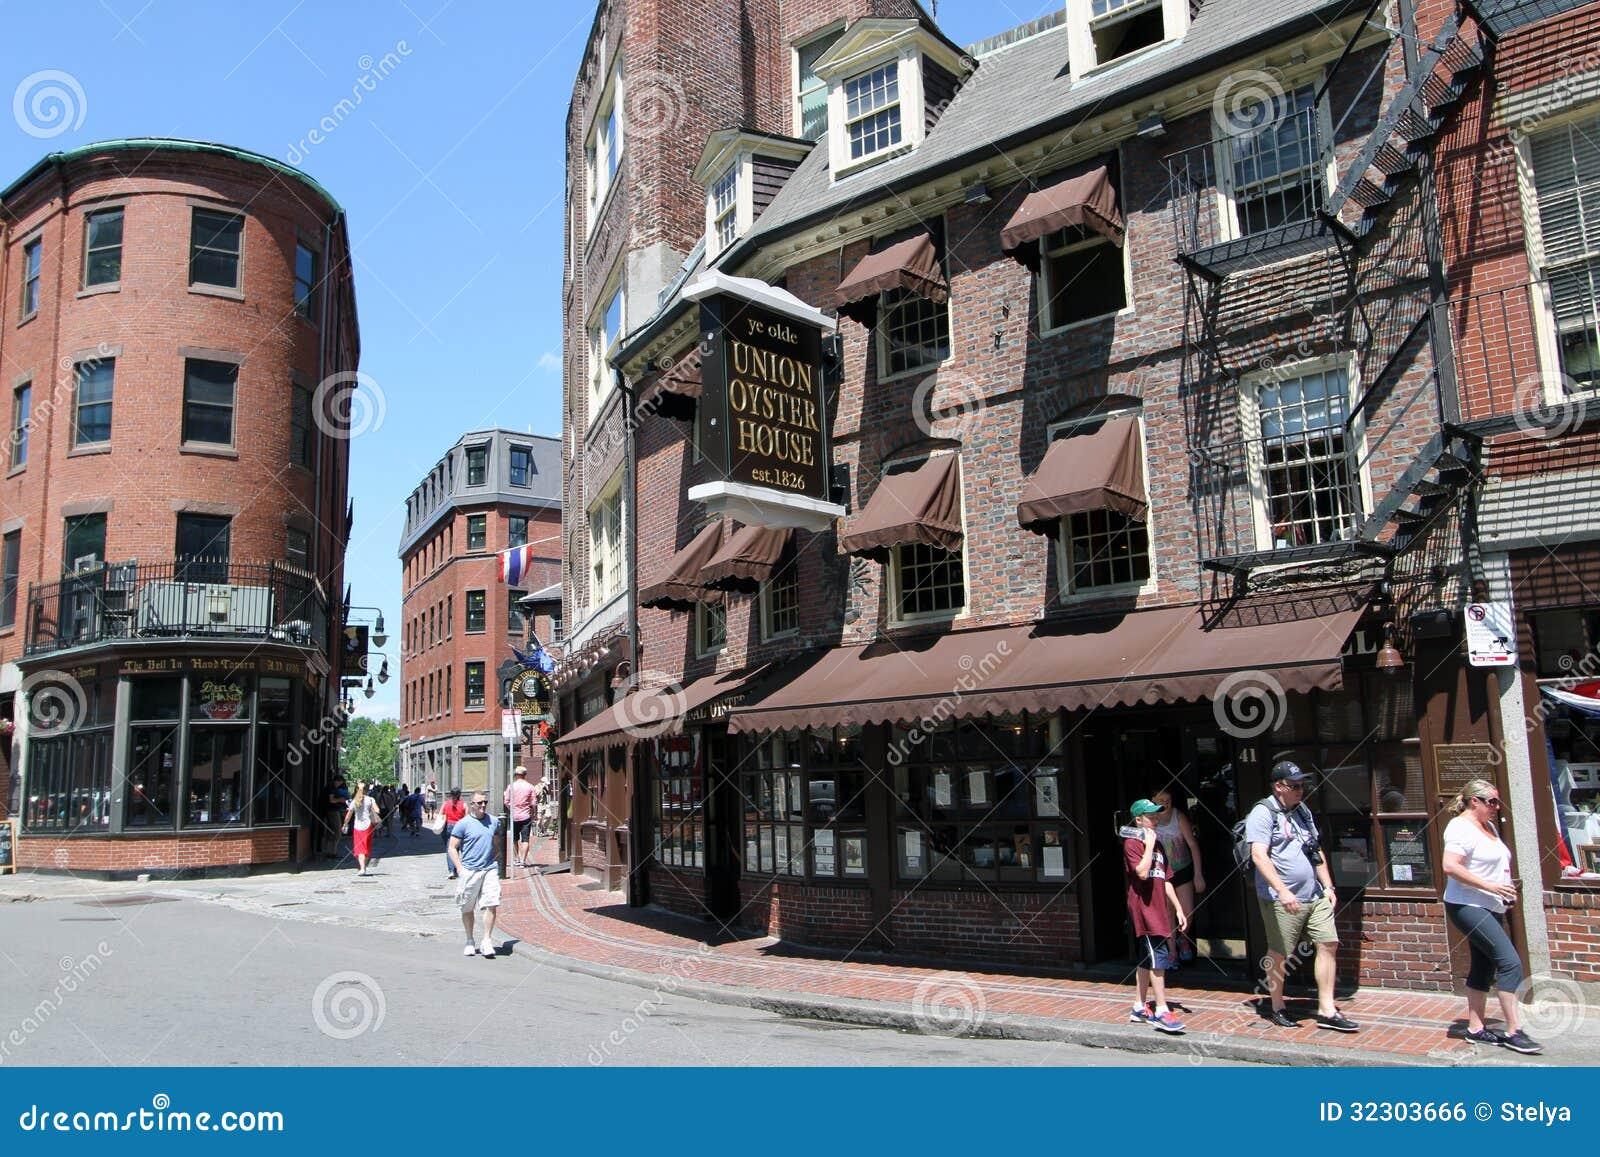 Union oyster house boston ma editorial photo image 32303666 for American cuisine boston